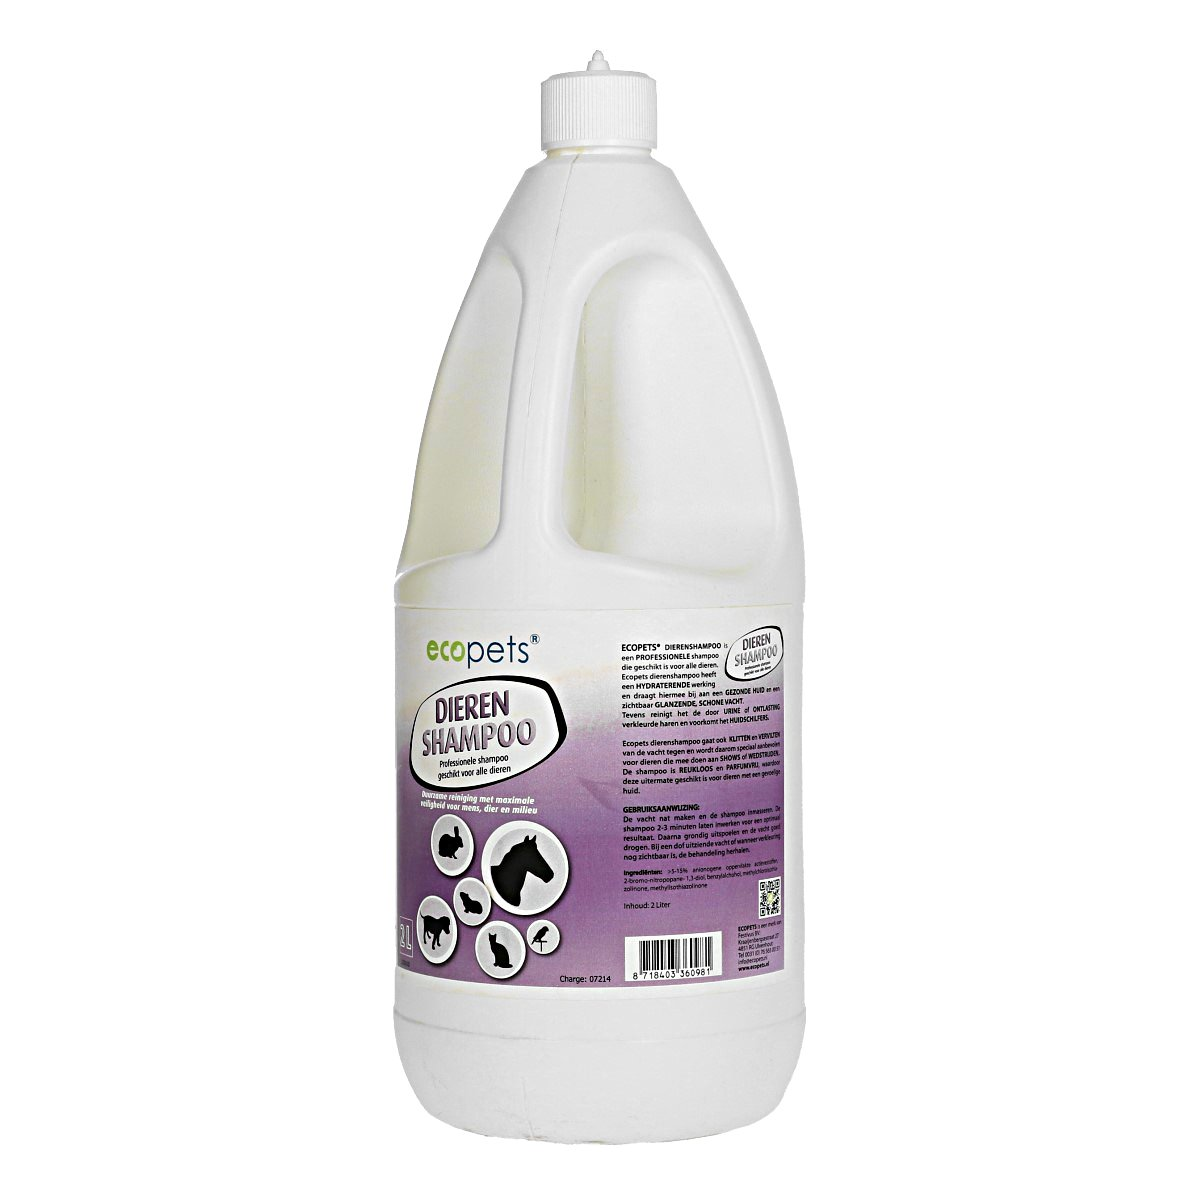 Afbeelding van Ecopets Shampoo 2L